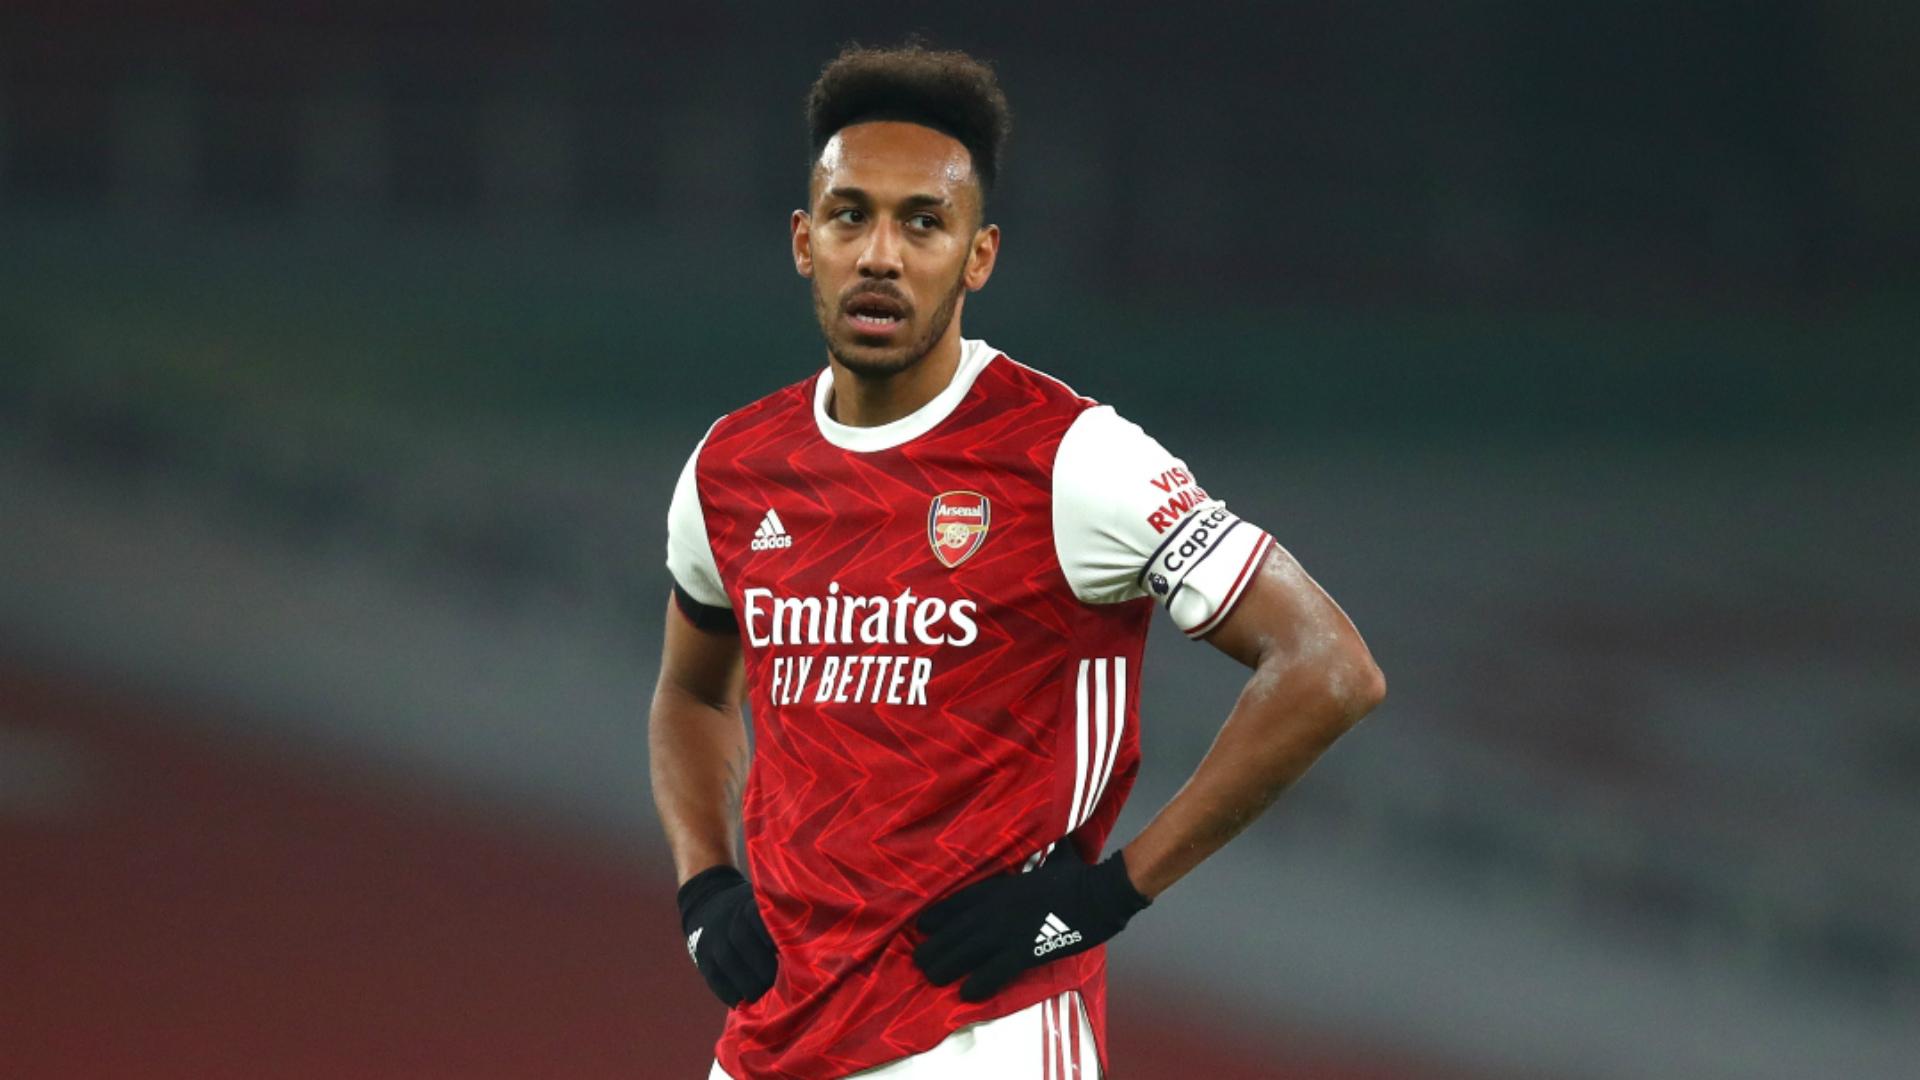 Arsenal boss Arteta urges slumping Aubameyang not to overthink things